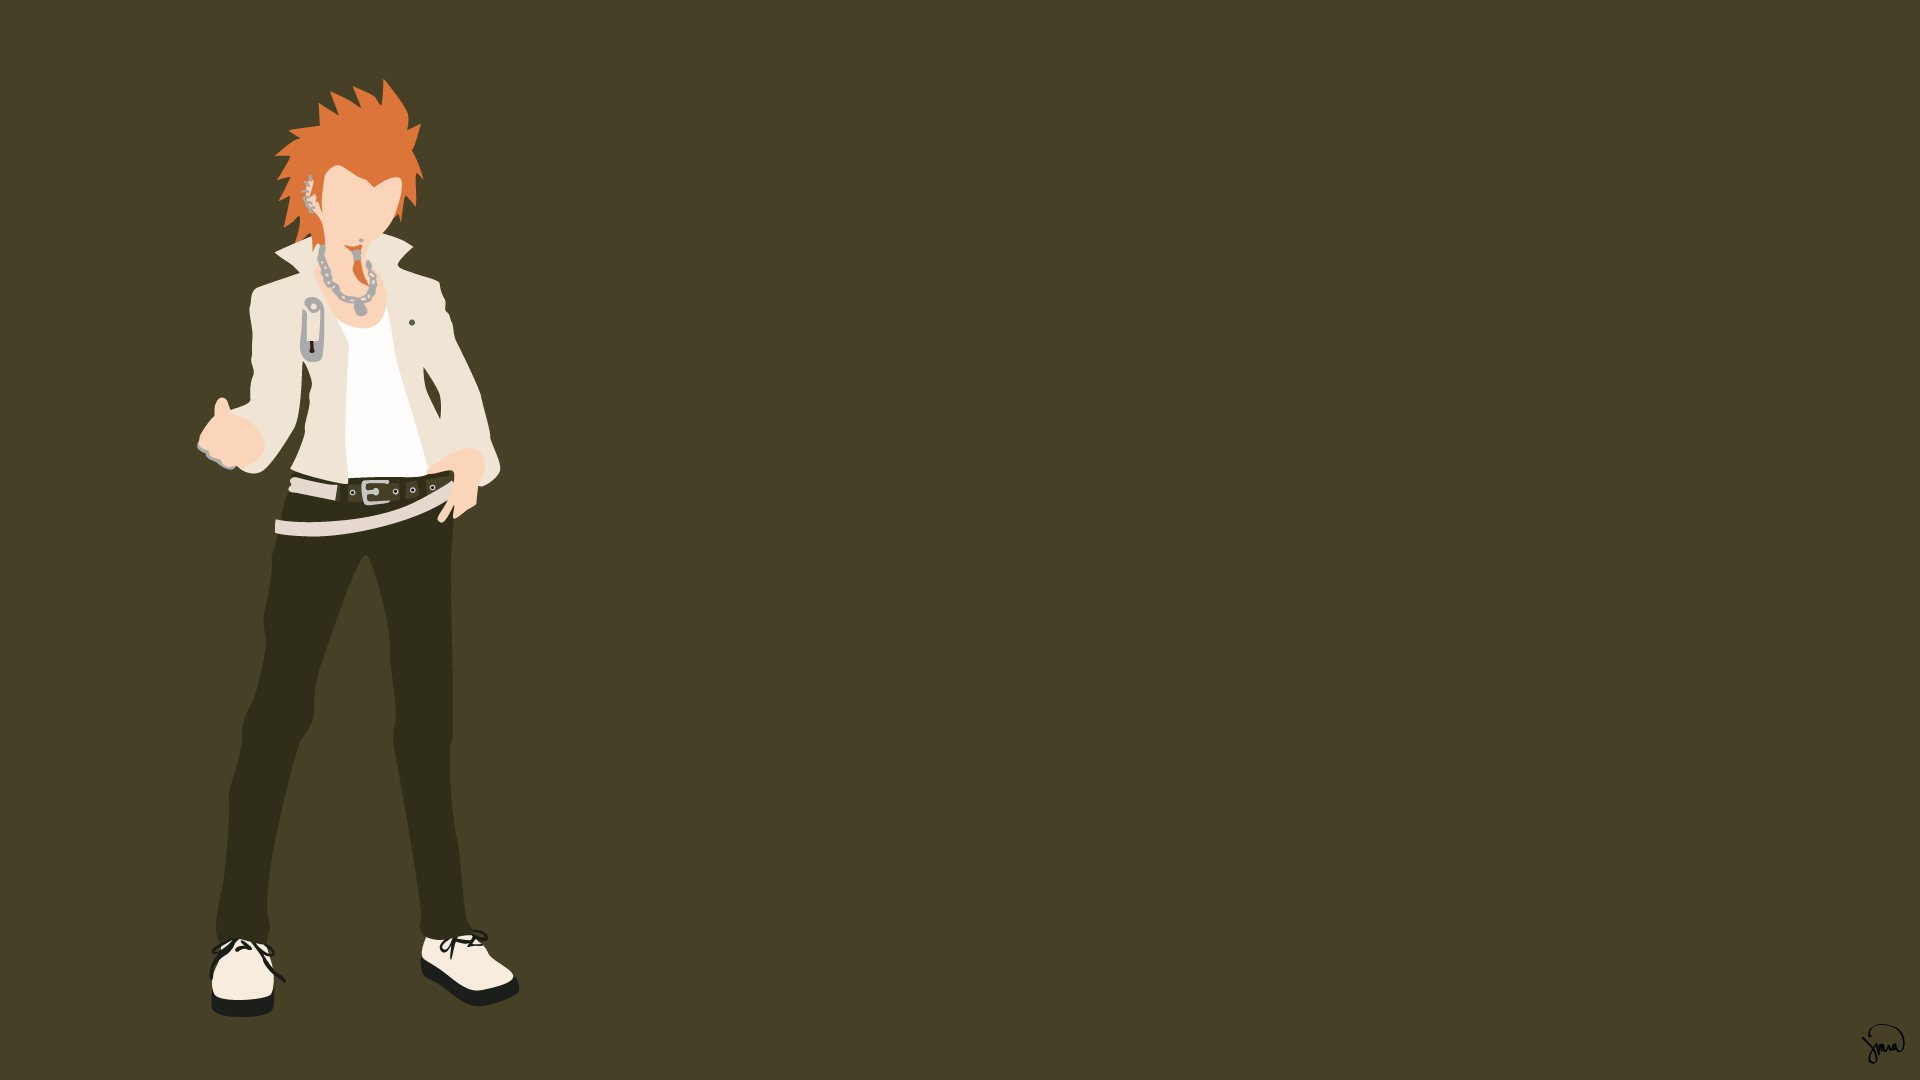 Image Result For Danganronpa Anime Iphone Wallpaper